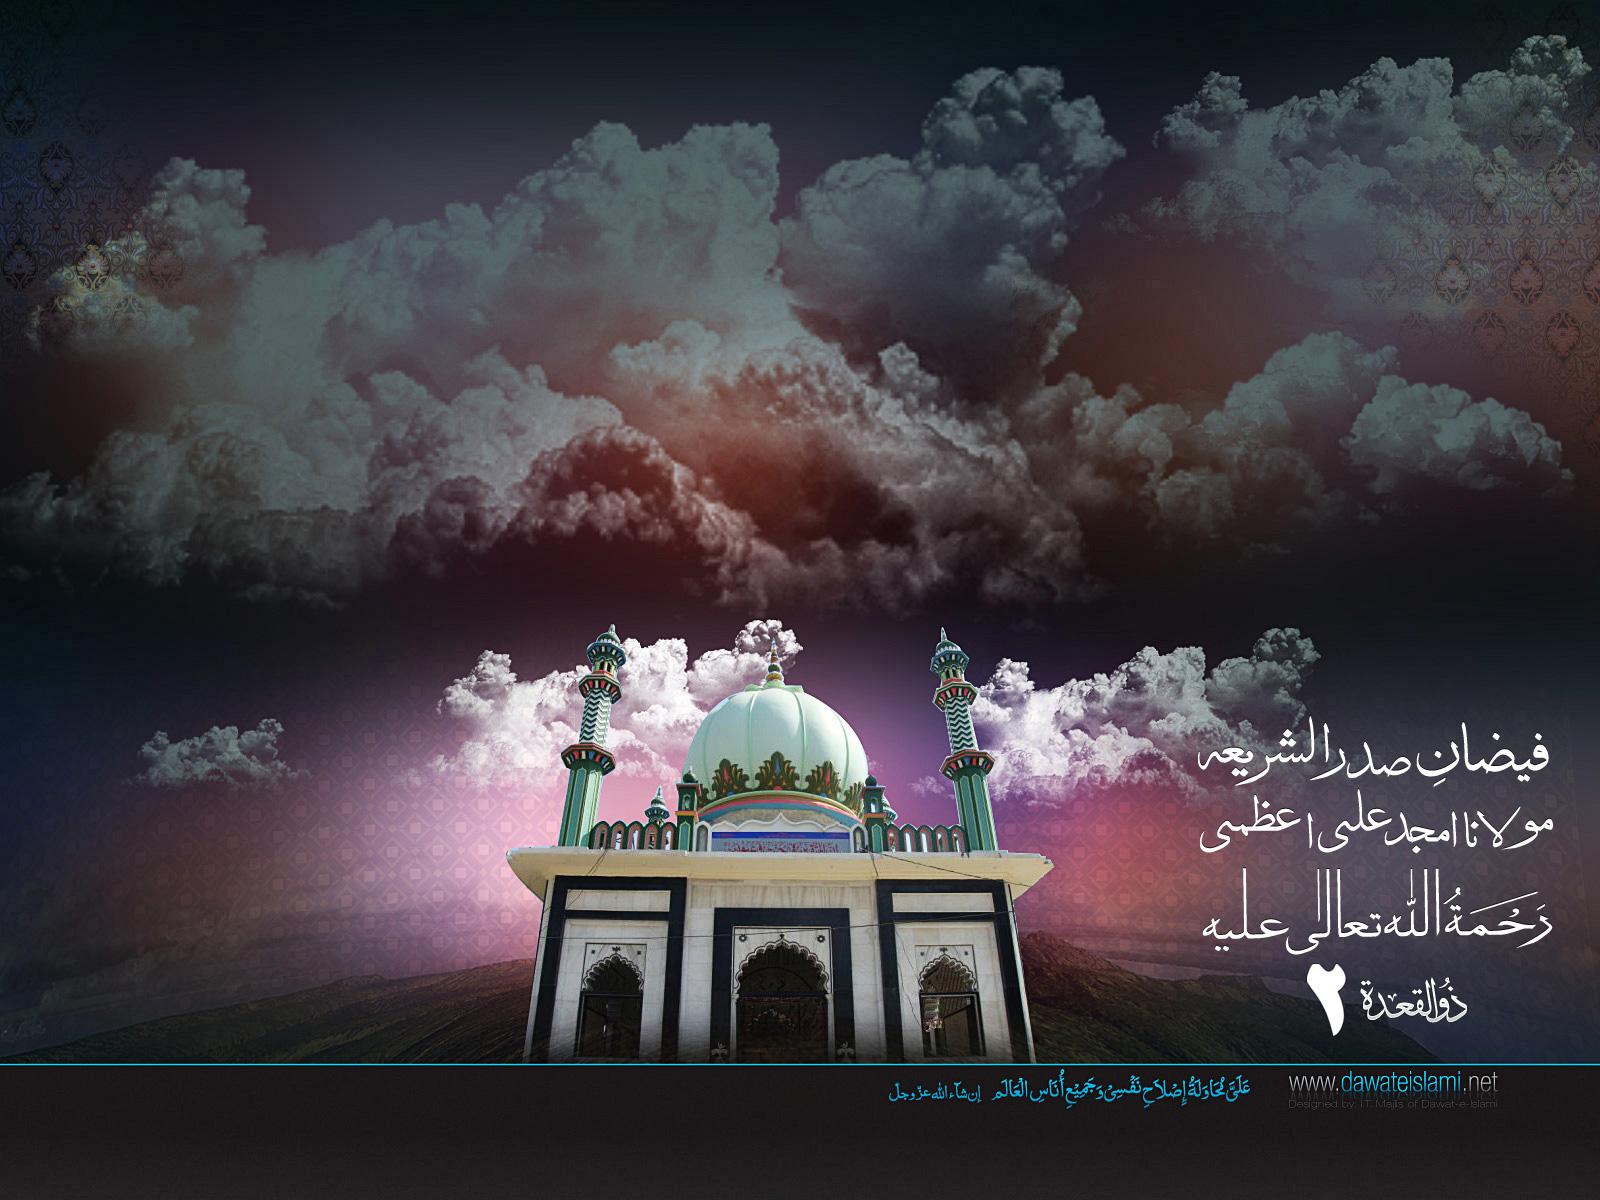 http://1.bp.blogspot.com/-4lOZNeRmt6k/UG3EGd8gnTI/AAAAAAAAAcU/yMvJxoj4E6g/s1600/islamic-wallpapers-ziqad-sahib-e-bahar-e-shariat-sunni-muslim-scholar-3.jpg